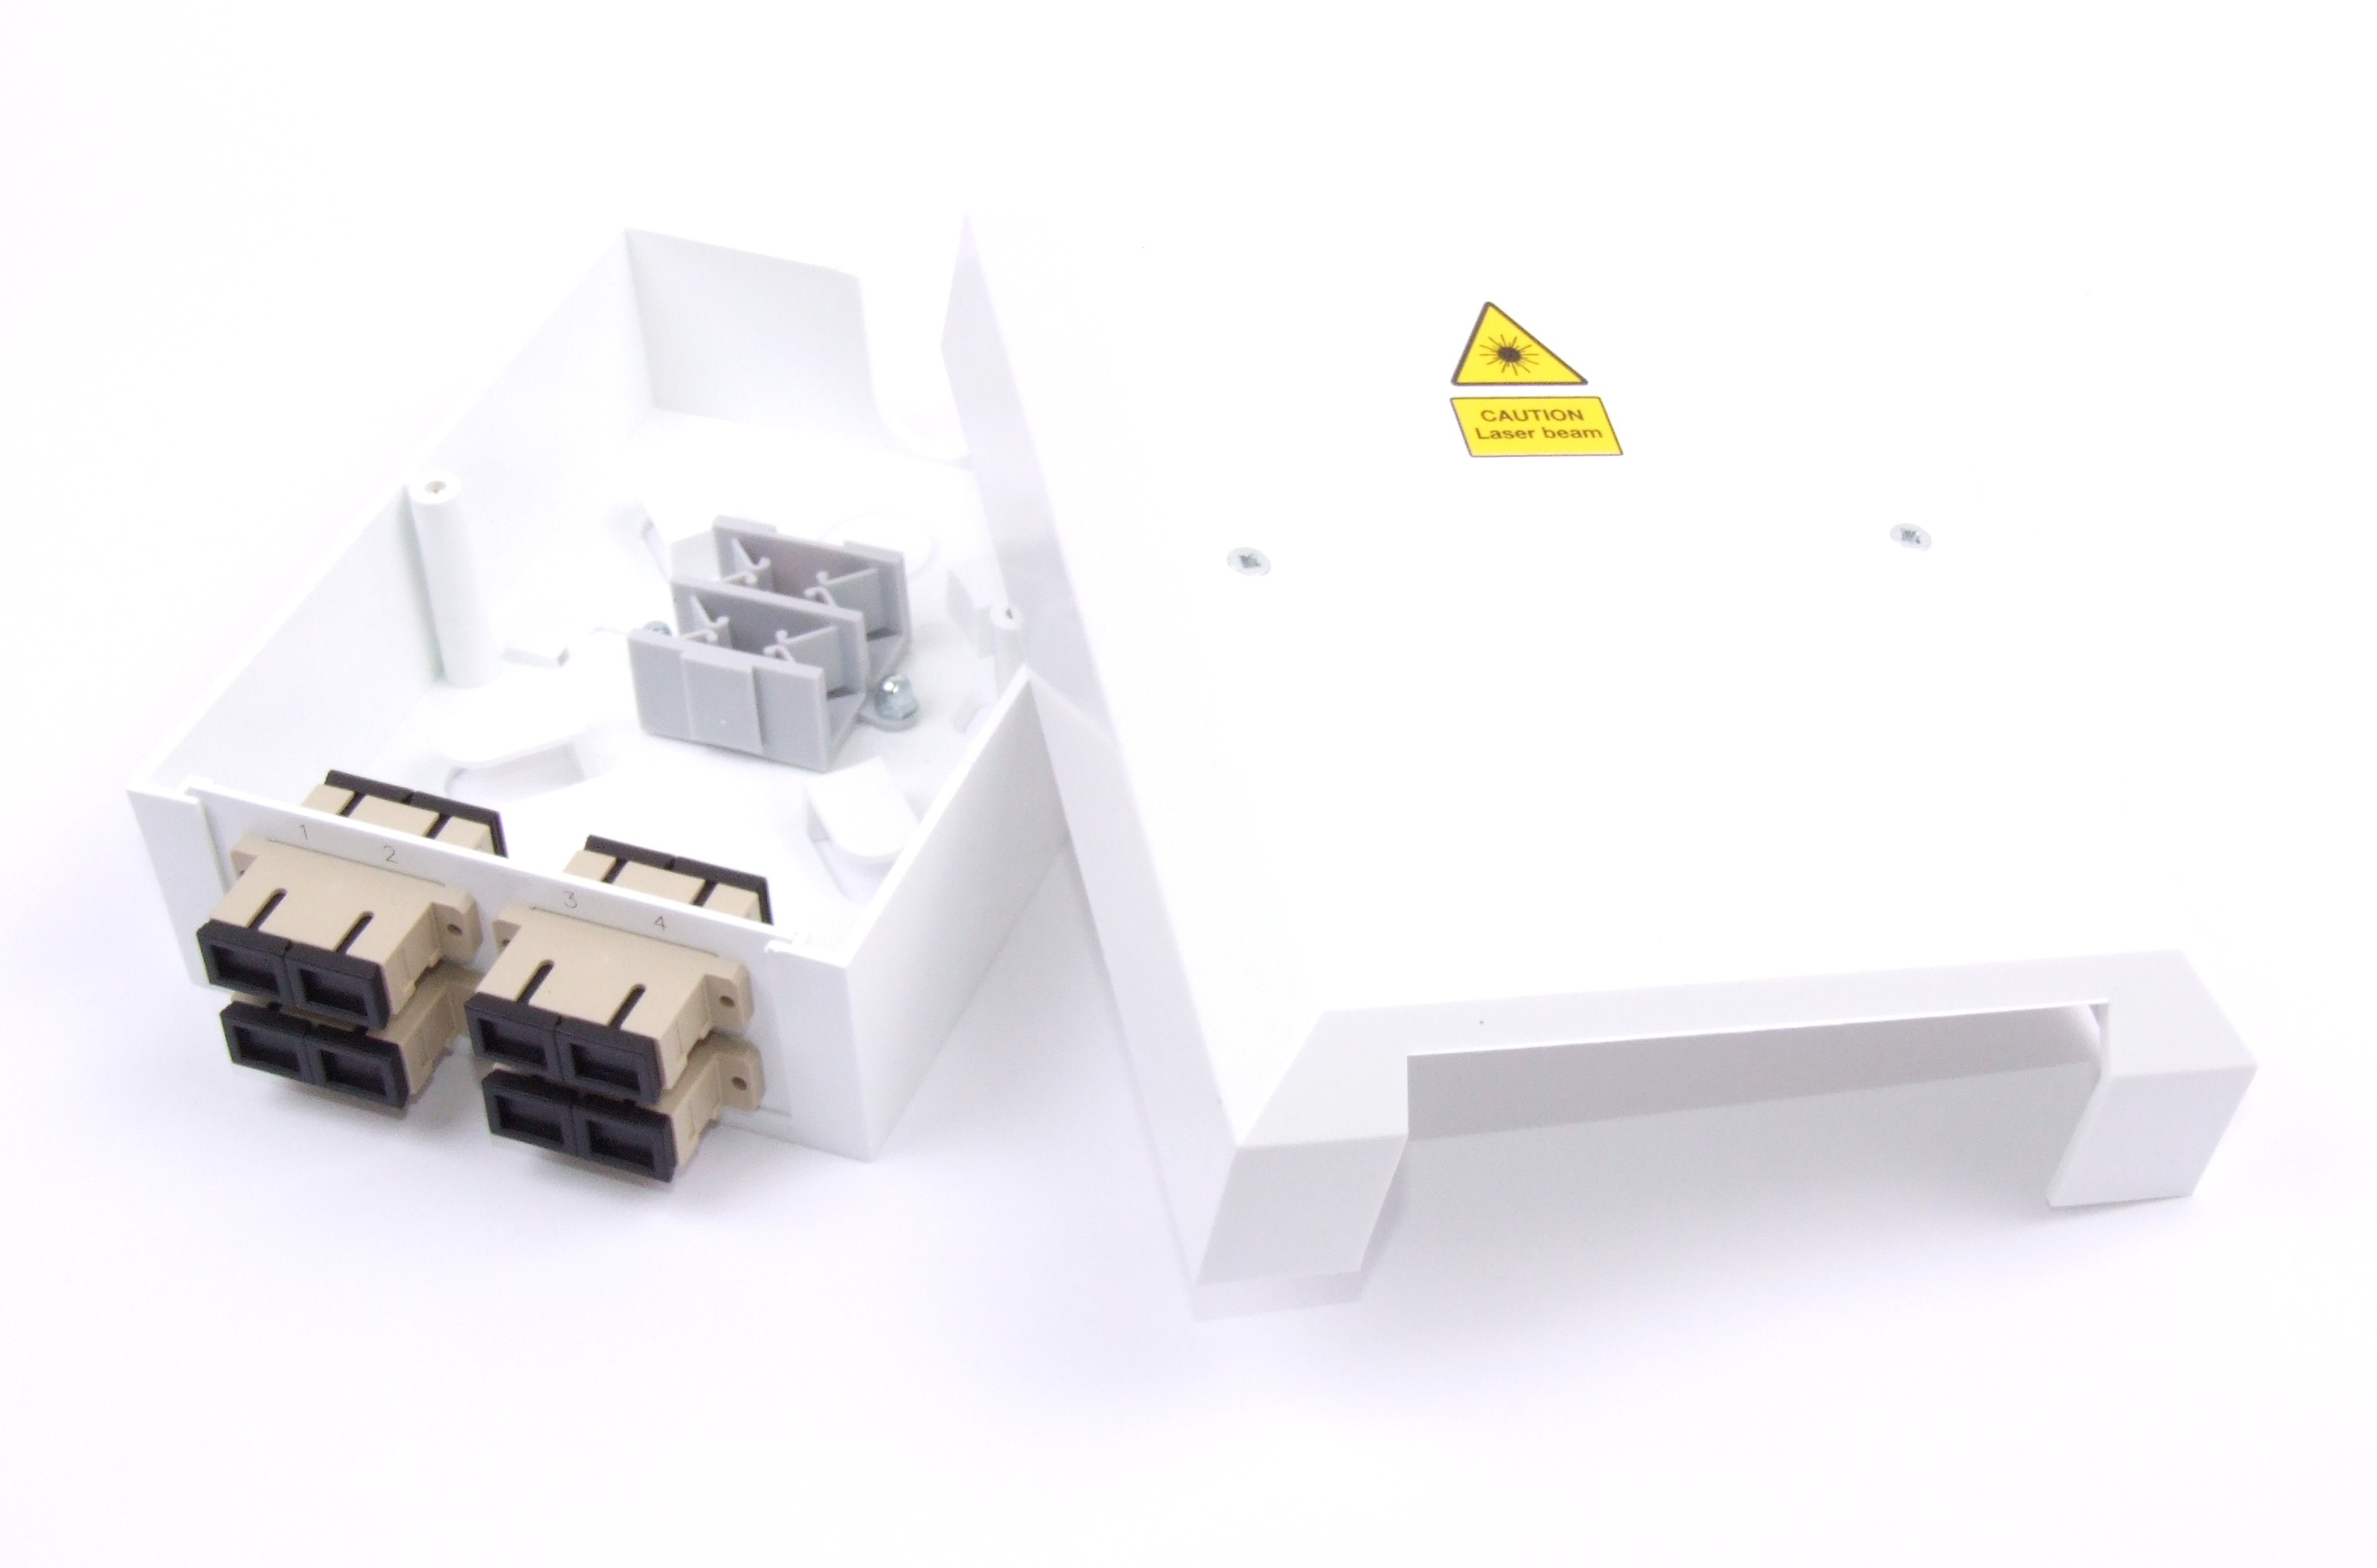 4 Way SC Multimode Optic Fibre Termination Box - adaptors & pigtails